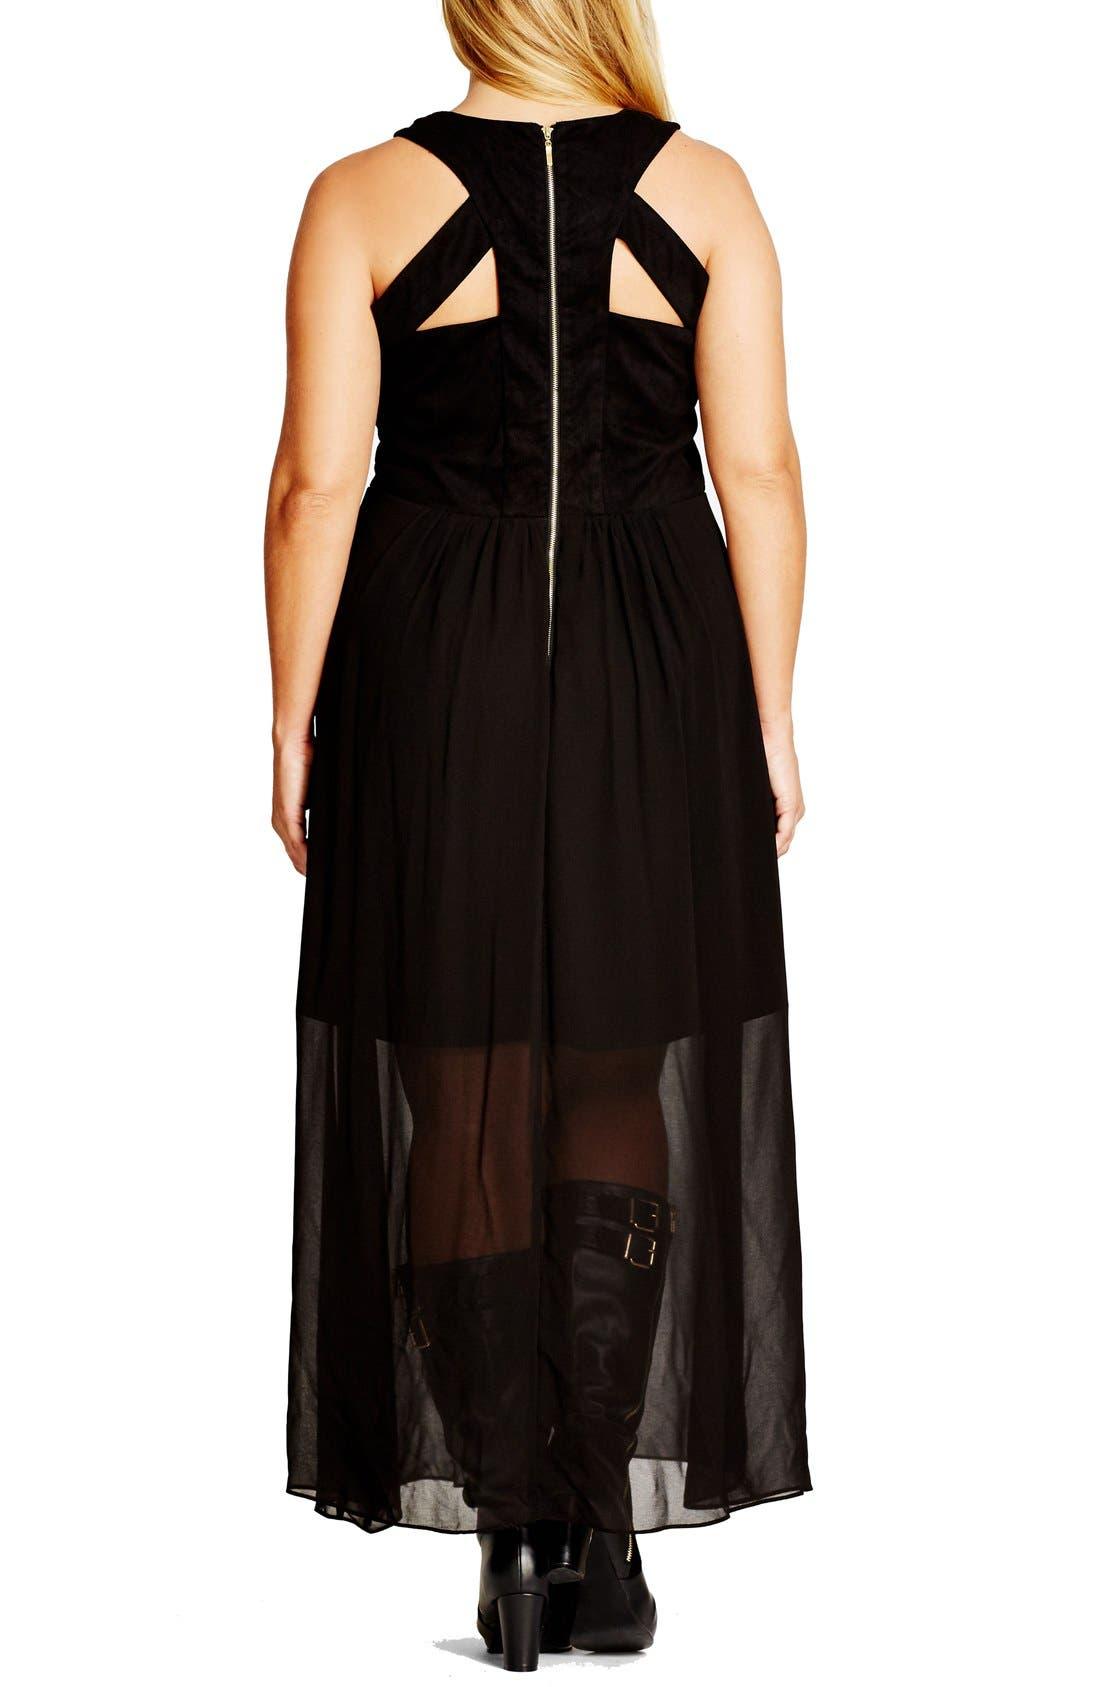 Alternate Image 2  - City Chic 'Rhianna' Lace-Up Trim Faux Suede & Chiffon Maxi Dress (Plus Size)